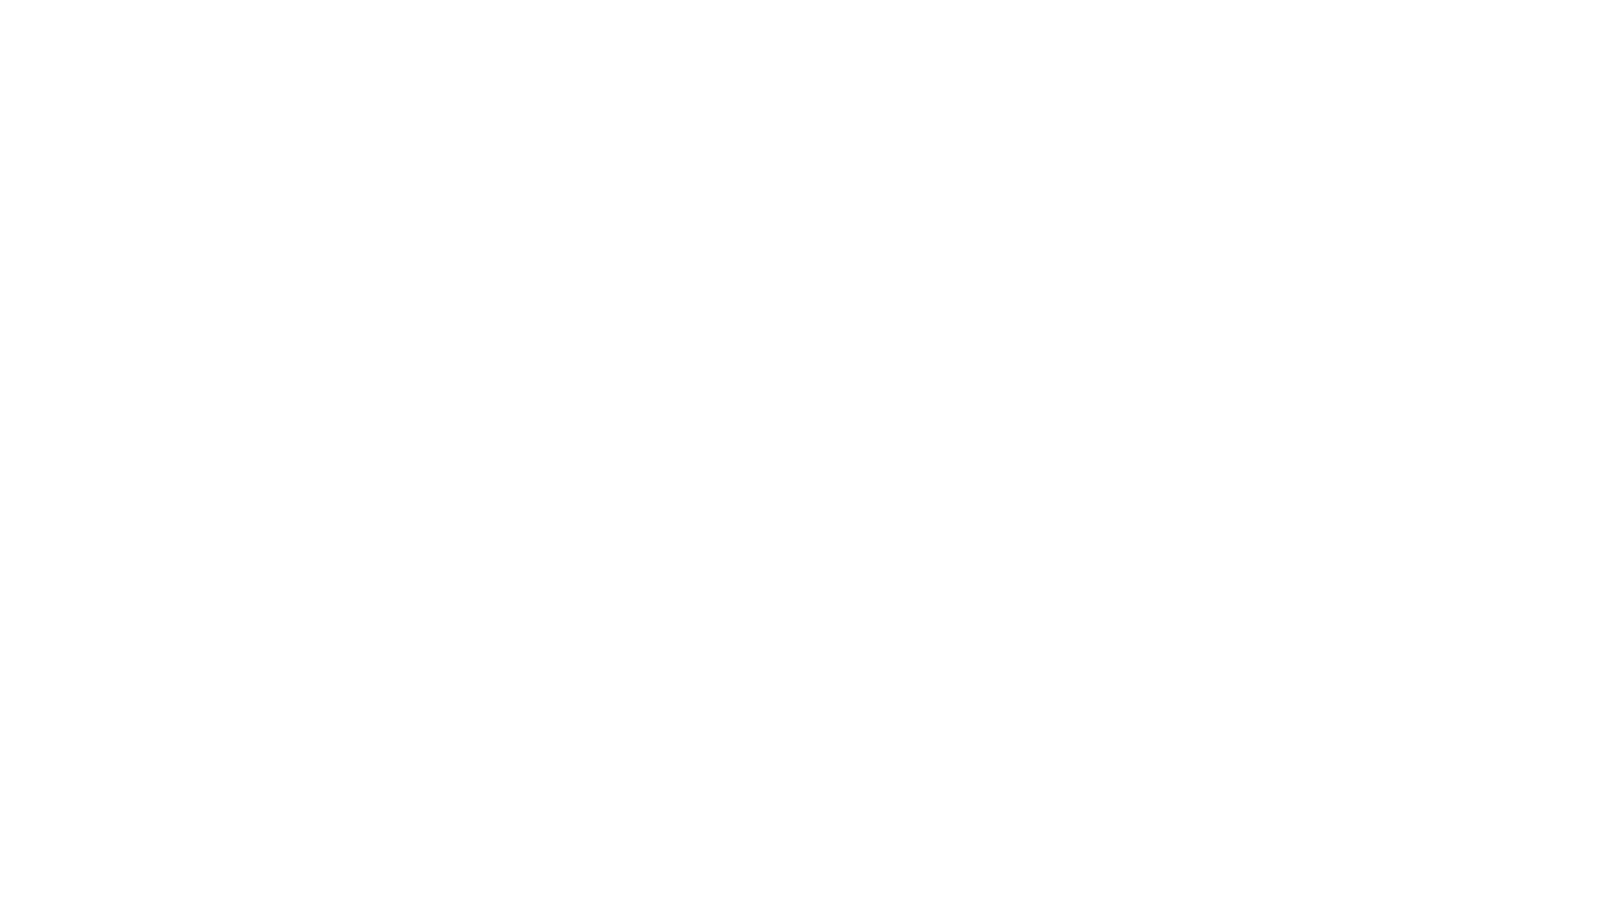 "Ah, lève-toi, soléil! ""Roméo et Juliette"" Charles Gounod  No puede ser ""La tabernera del puerto"" Pablo Sorozábal  On the street where you live  ""My fair Lady""  Friedrich Loewe   Maria  ""West Side Story"" Leonard Bernstein  The impossible dream ""Man of La Mancha"" Mitch Leigh   Intermedio   La Danza  ""Gioachino Rossini""  In mir klingt ein Lied  op. 10 Nr. 3  ""Frédéric Chopin""  Alfonsina y el Mar  ""Ariel Ramírez""  Despedida  ""María Grever""  Uno  ""Mariano Mores"" Enrique Santos Discépolo  Júrame ""María Grever""   Zugabe:  Divina mujer ""Jorge Del Moral""    La Mer ""Charles Trenet"""